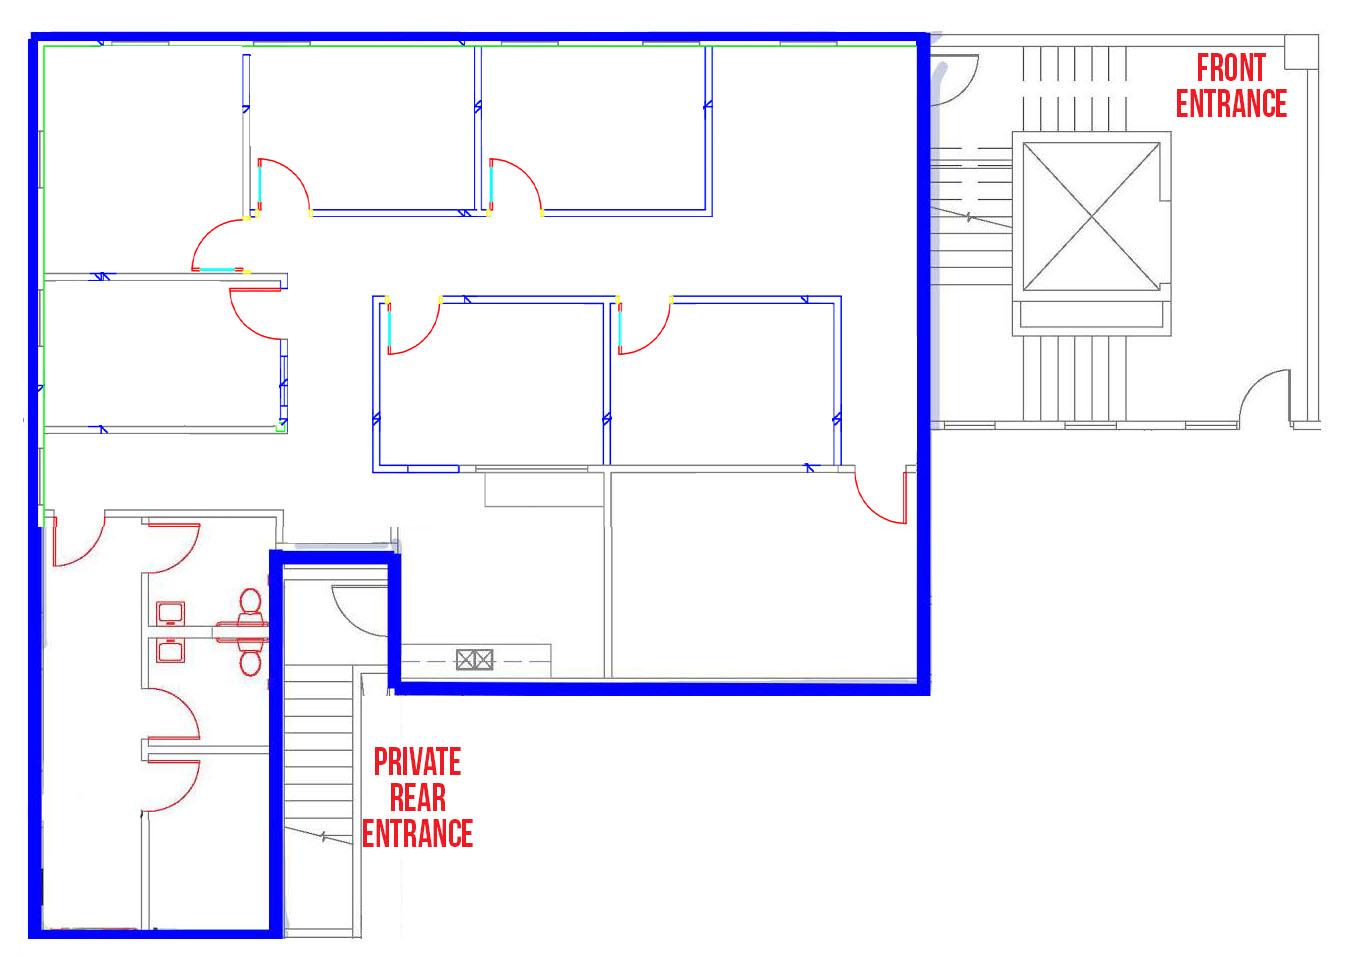 Sun Center Floor Plan Updated.jpg